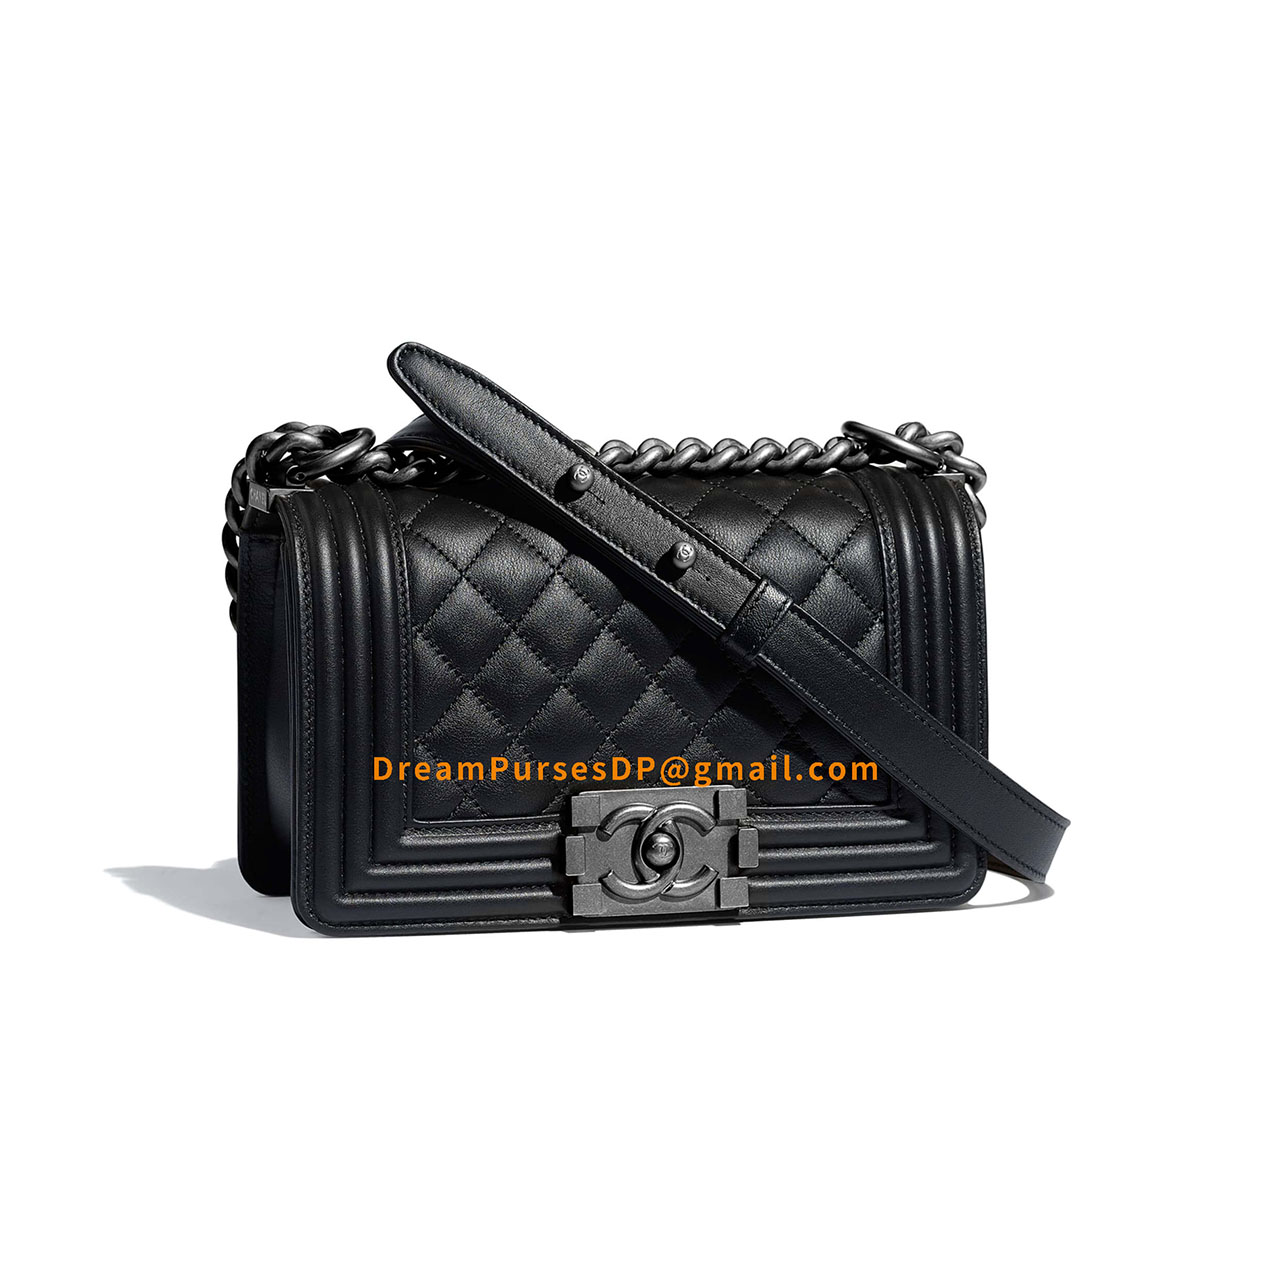 Chanel Boy Bag Small In Black Lambskin With Silver HW